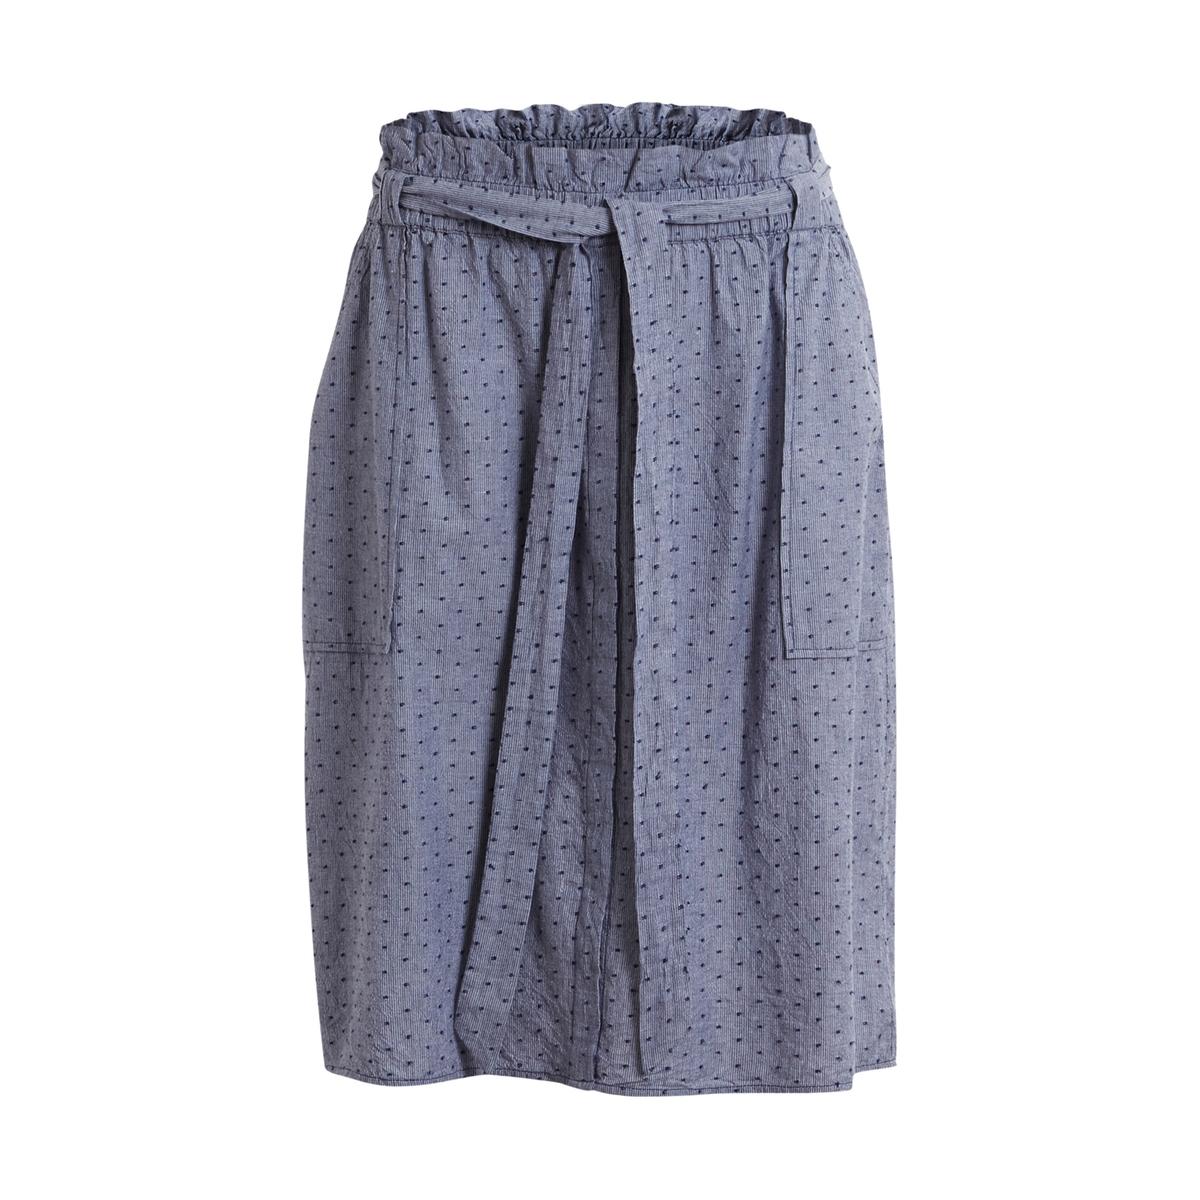 Юбка-миди с карманами VIDOTTA SKIRTСостав и описаниеМарка : VILAМатериал : 100% хлопок<br><br>Цвет: темно-синий меланж<br>Размер: L